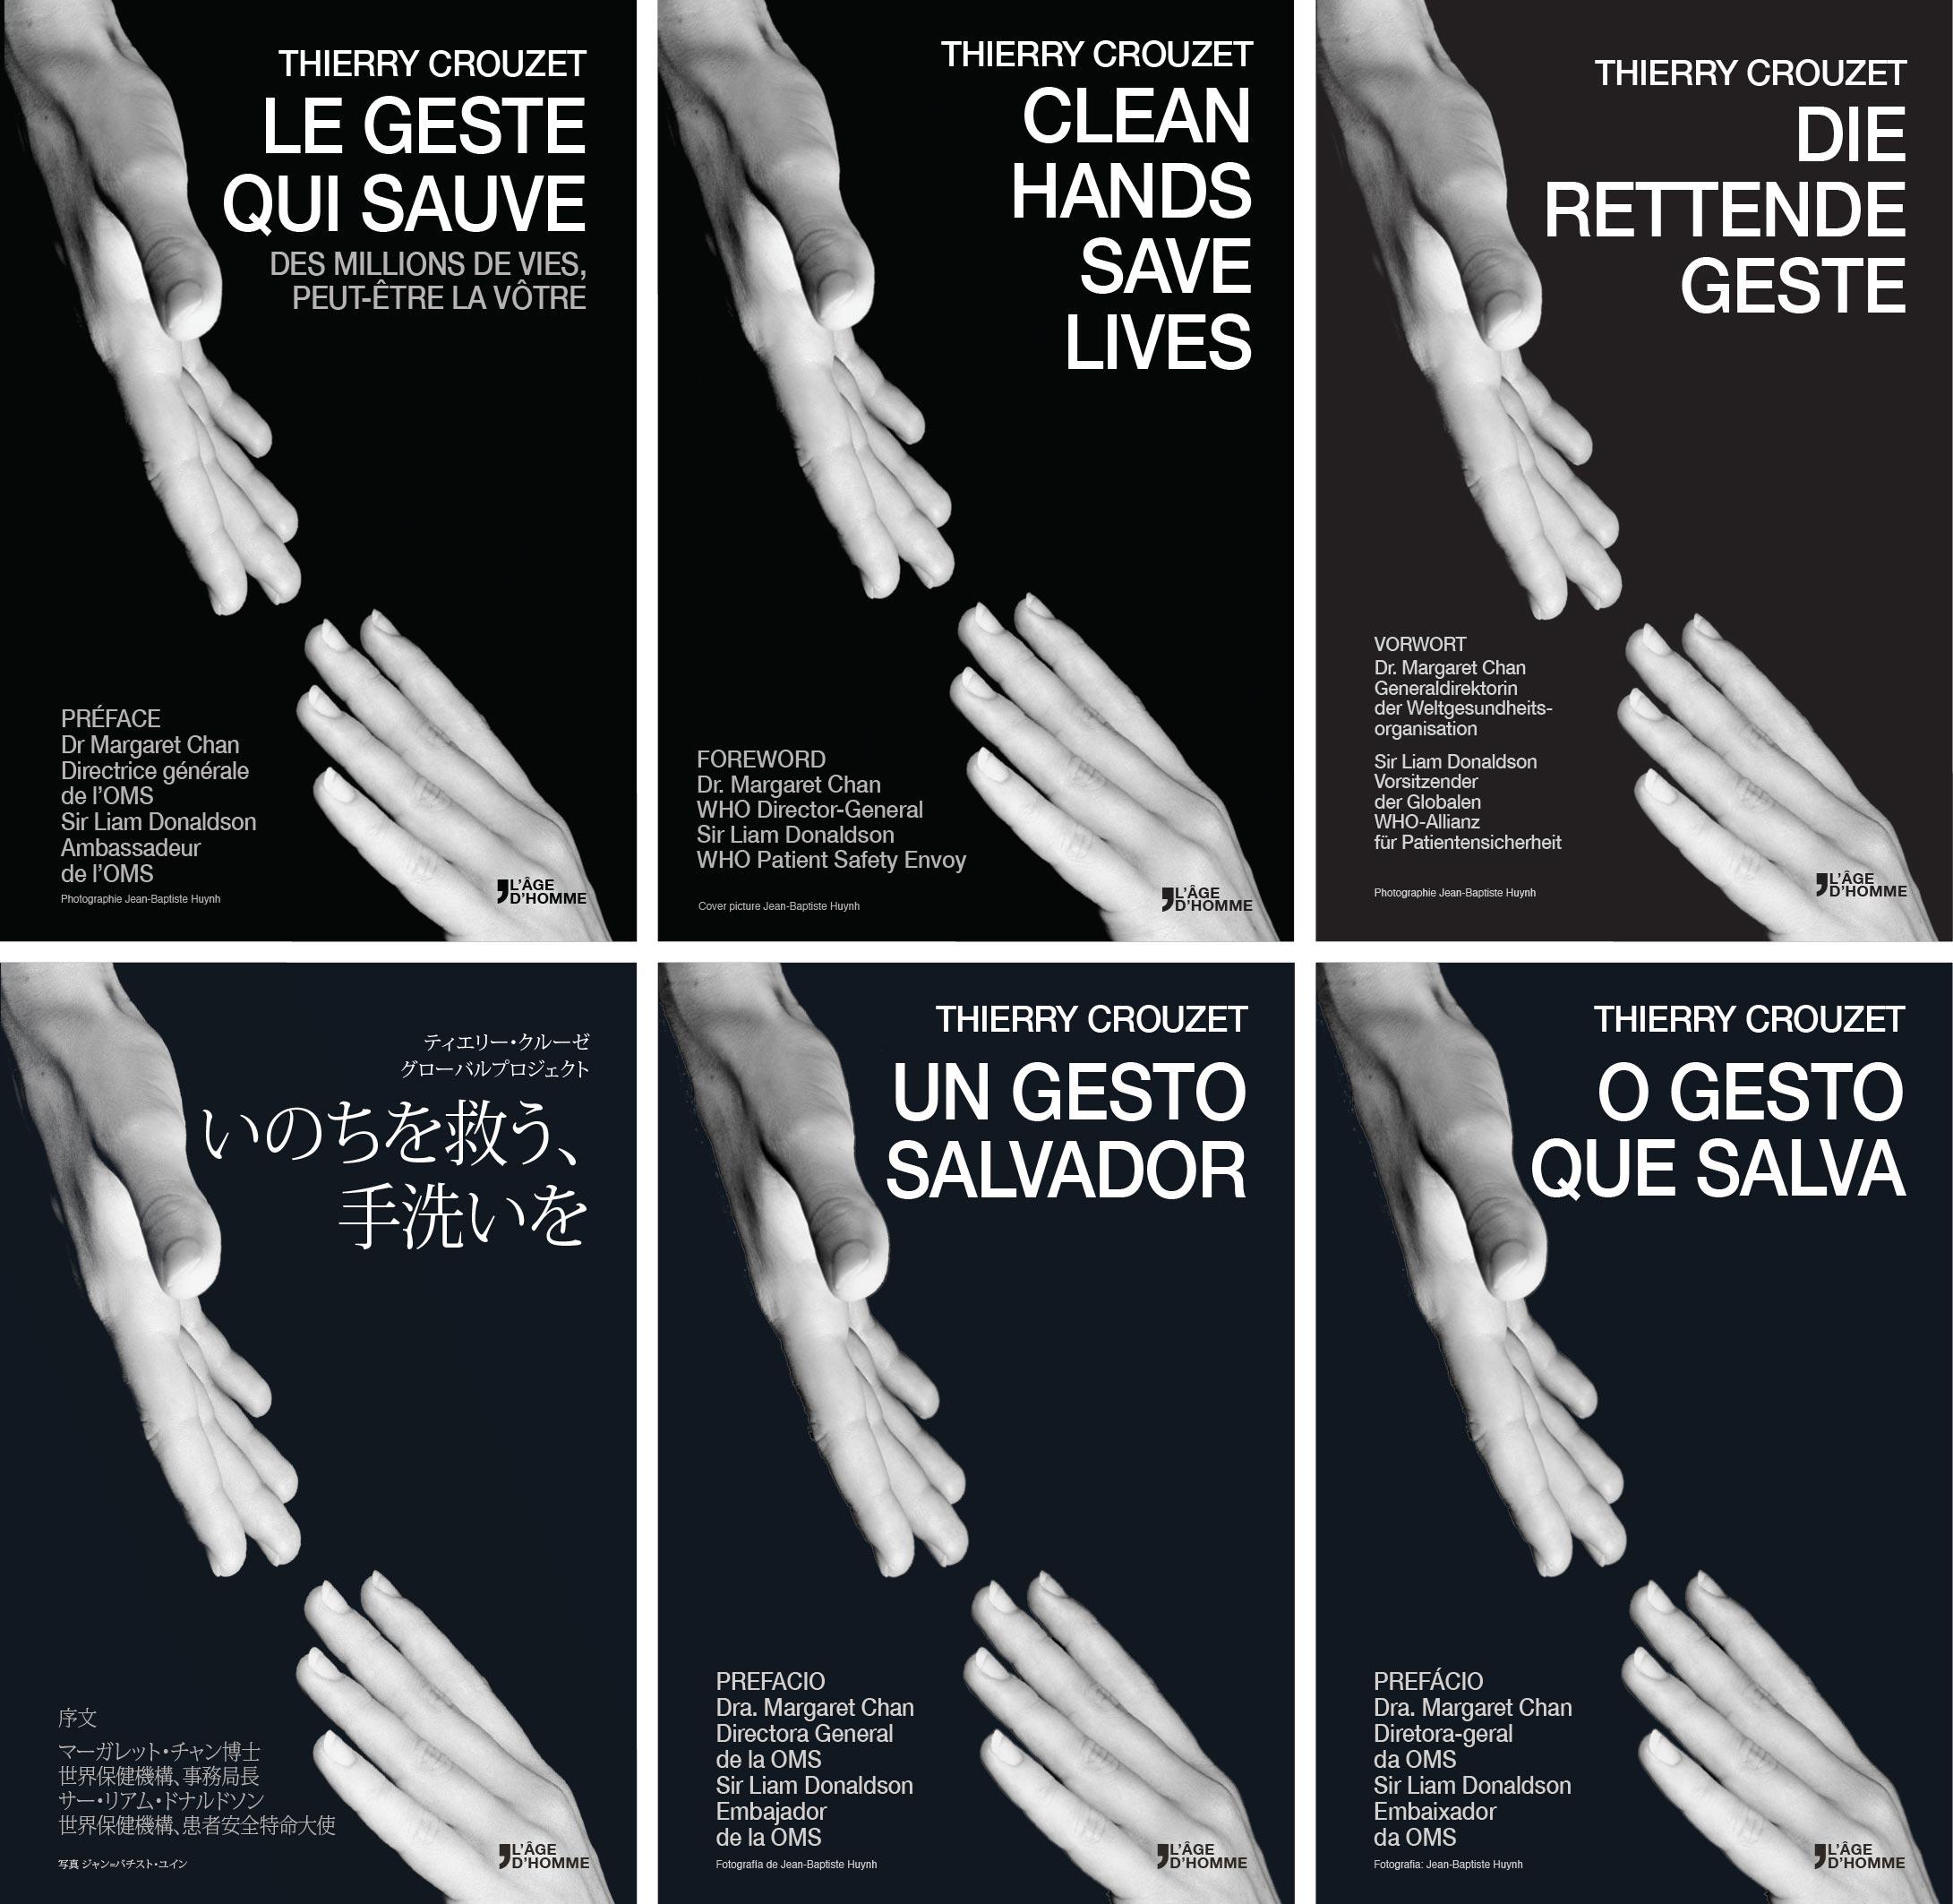 Dia 5 de maig. Dia mundial de la higiene de mans